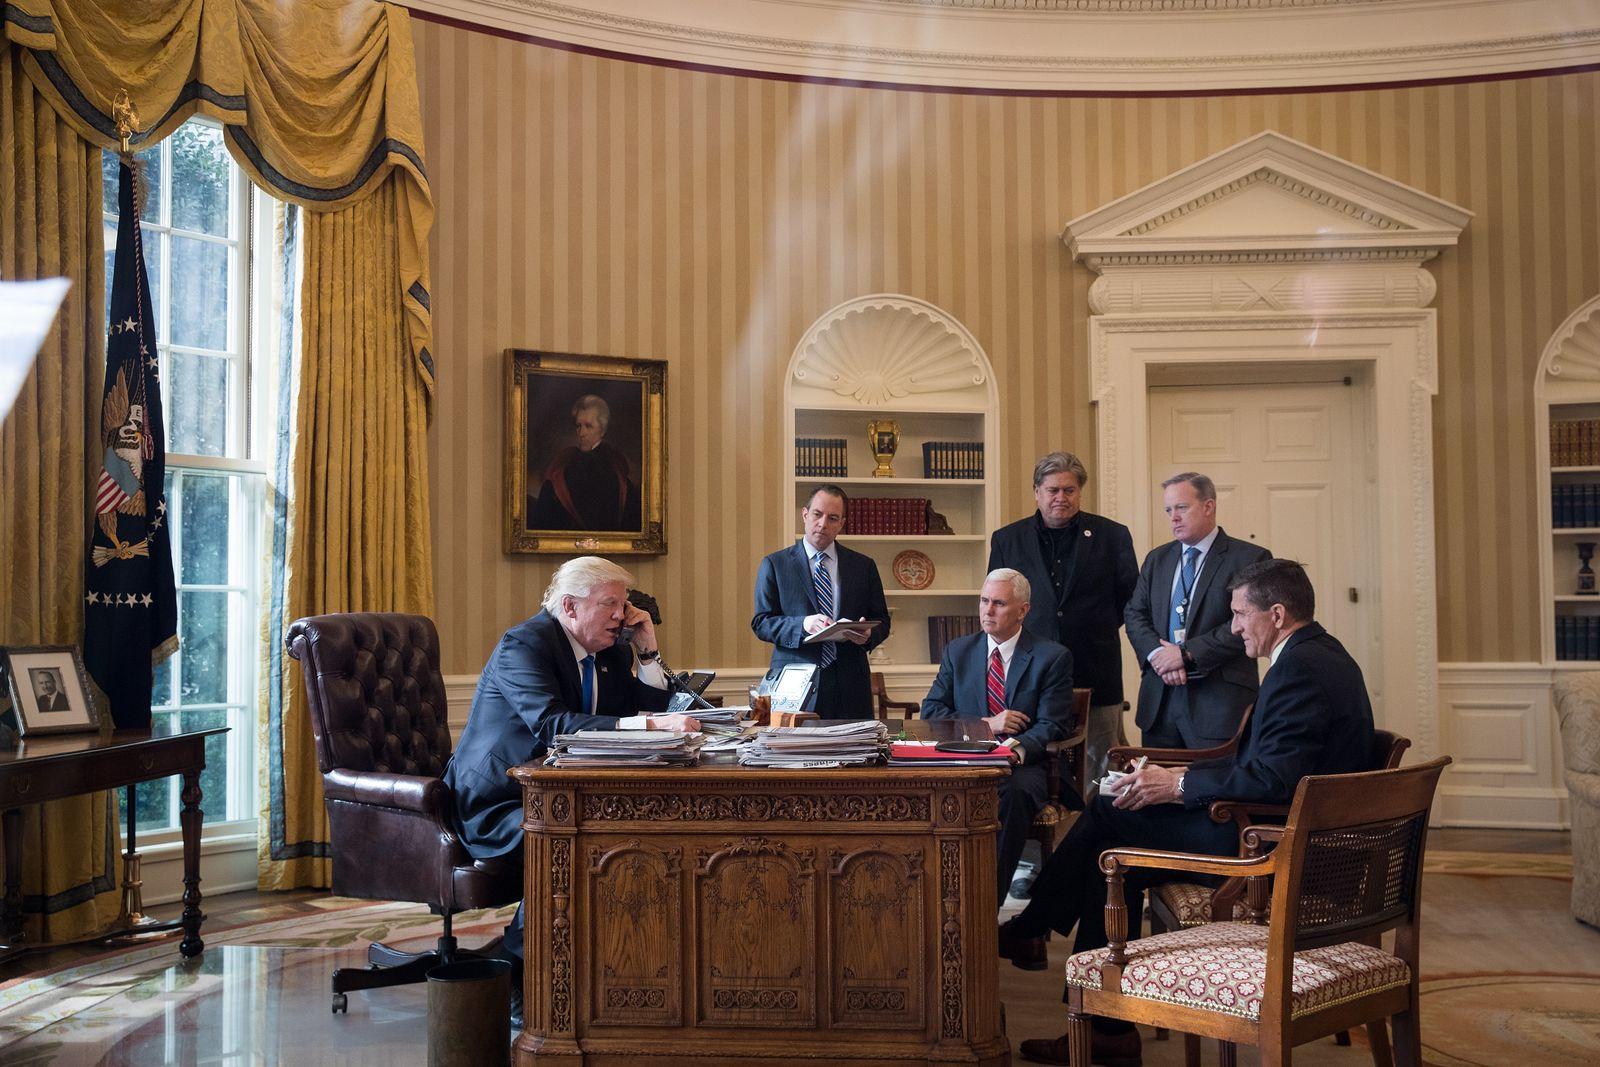 Donald Trump / Oval Office